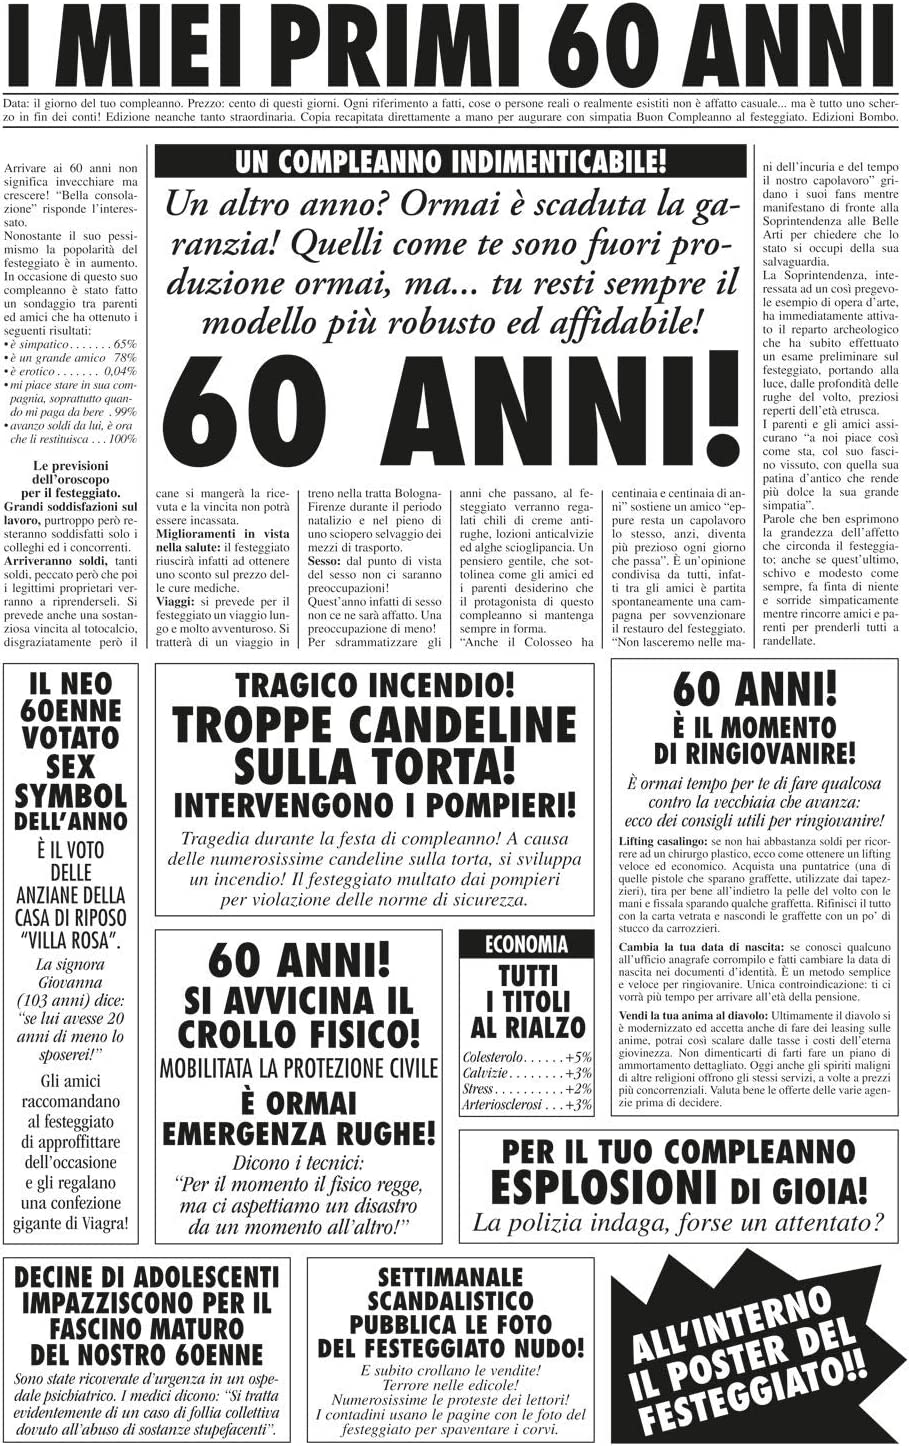 Peanuts Chorus Intrusion I Miei Primi 40 Anni Frasi Amazon Onoyelken Com